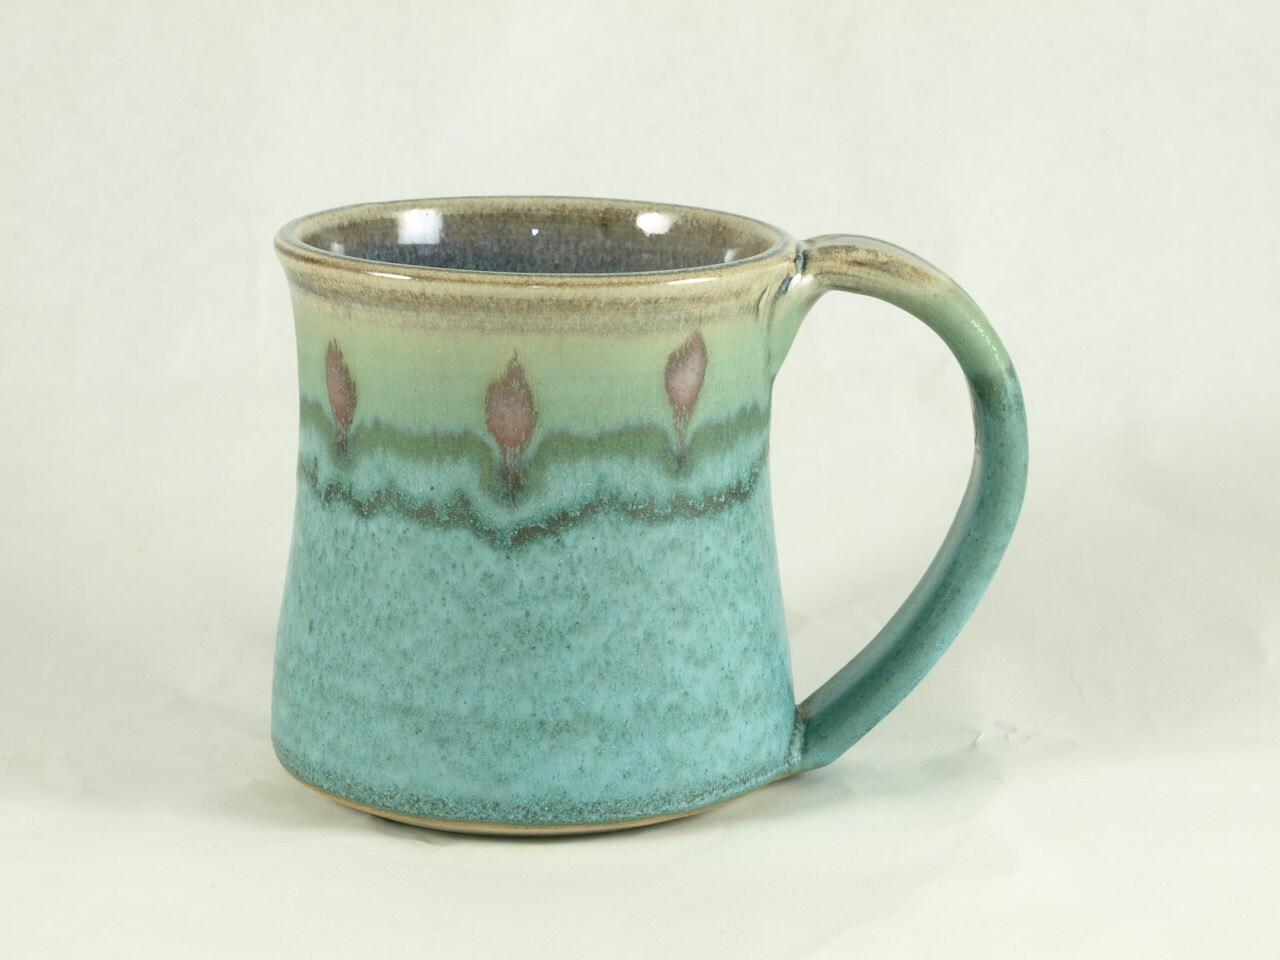 Coffee Mug Cup Ceramic Mugs With Large Handle Turquoise